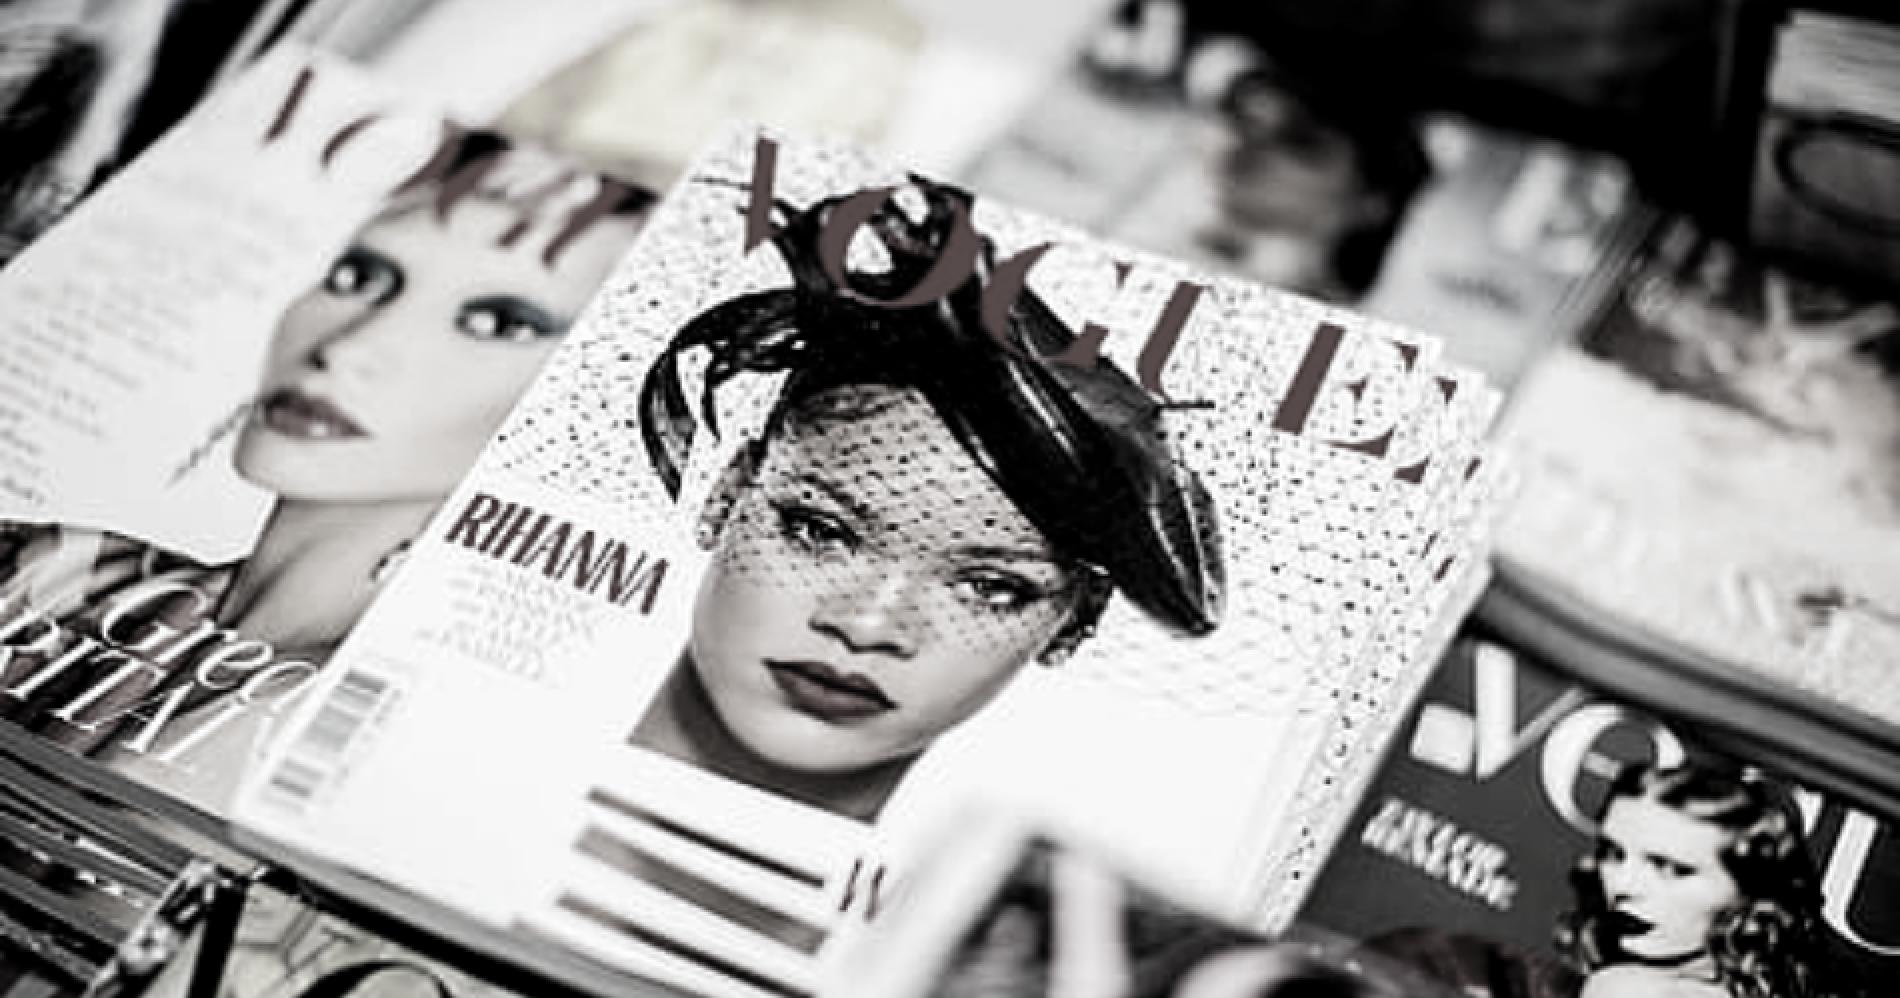 Rihanna Illustration Web Bisnis Muda - Piqsels